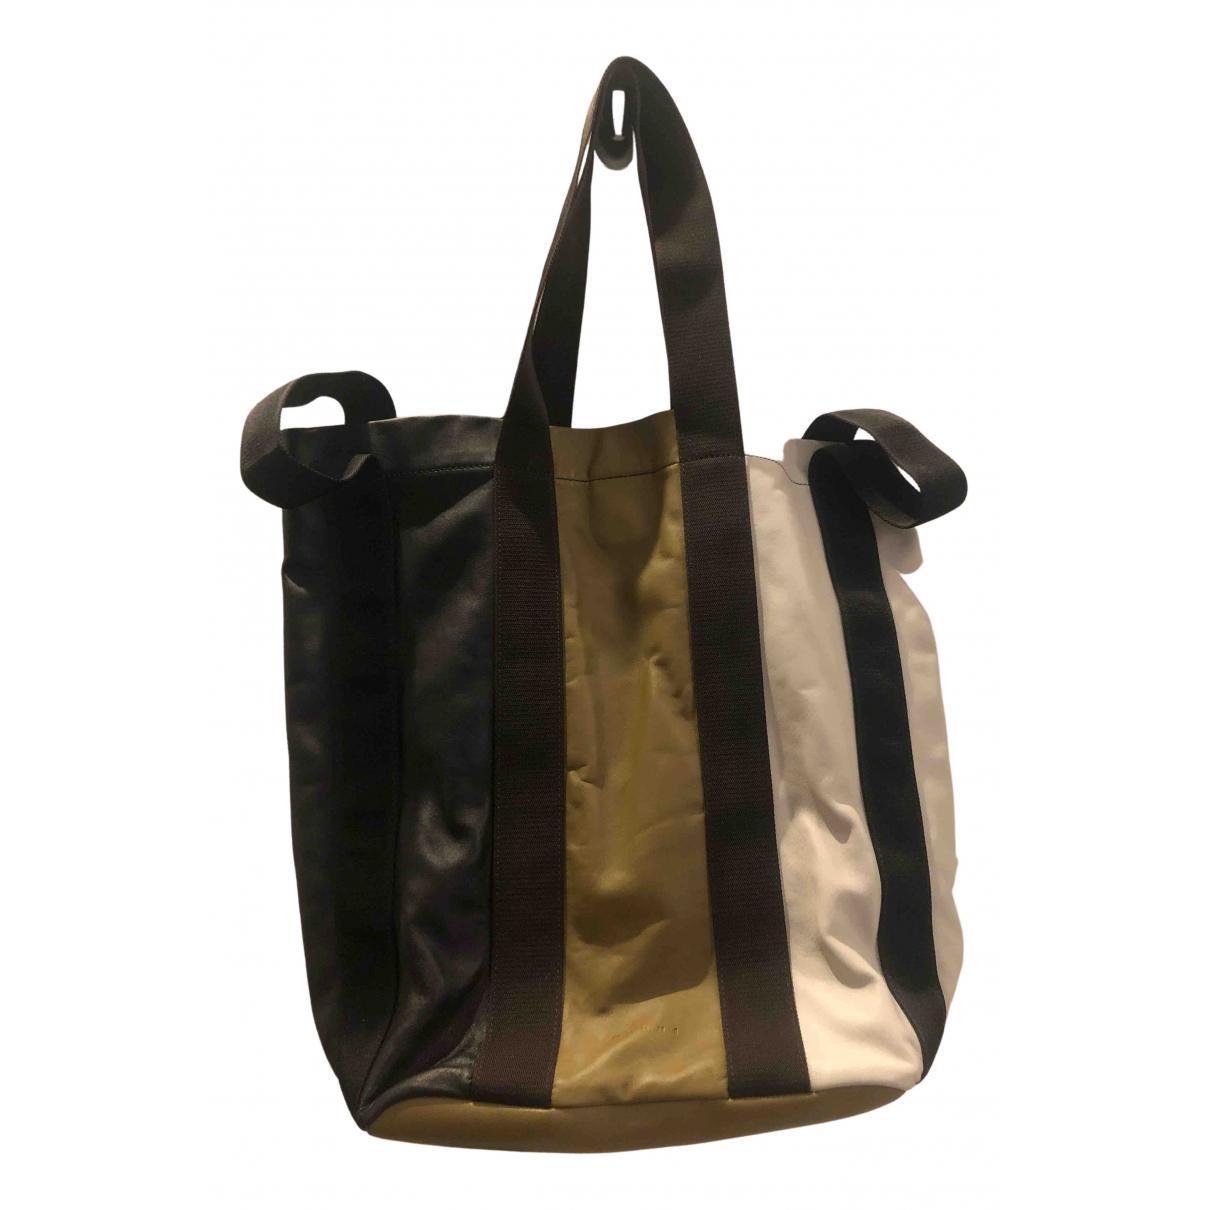 Marni N Multicolour Leather handbag for Women N